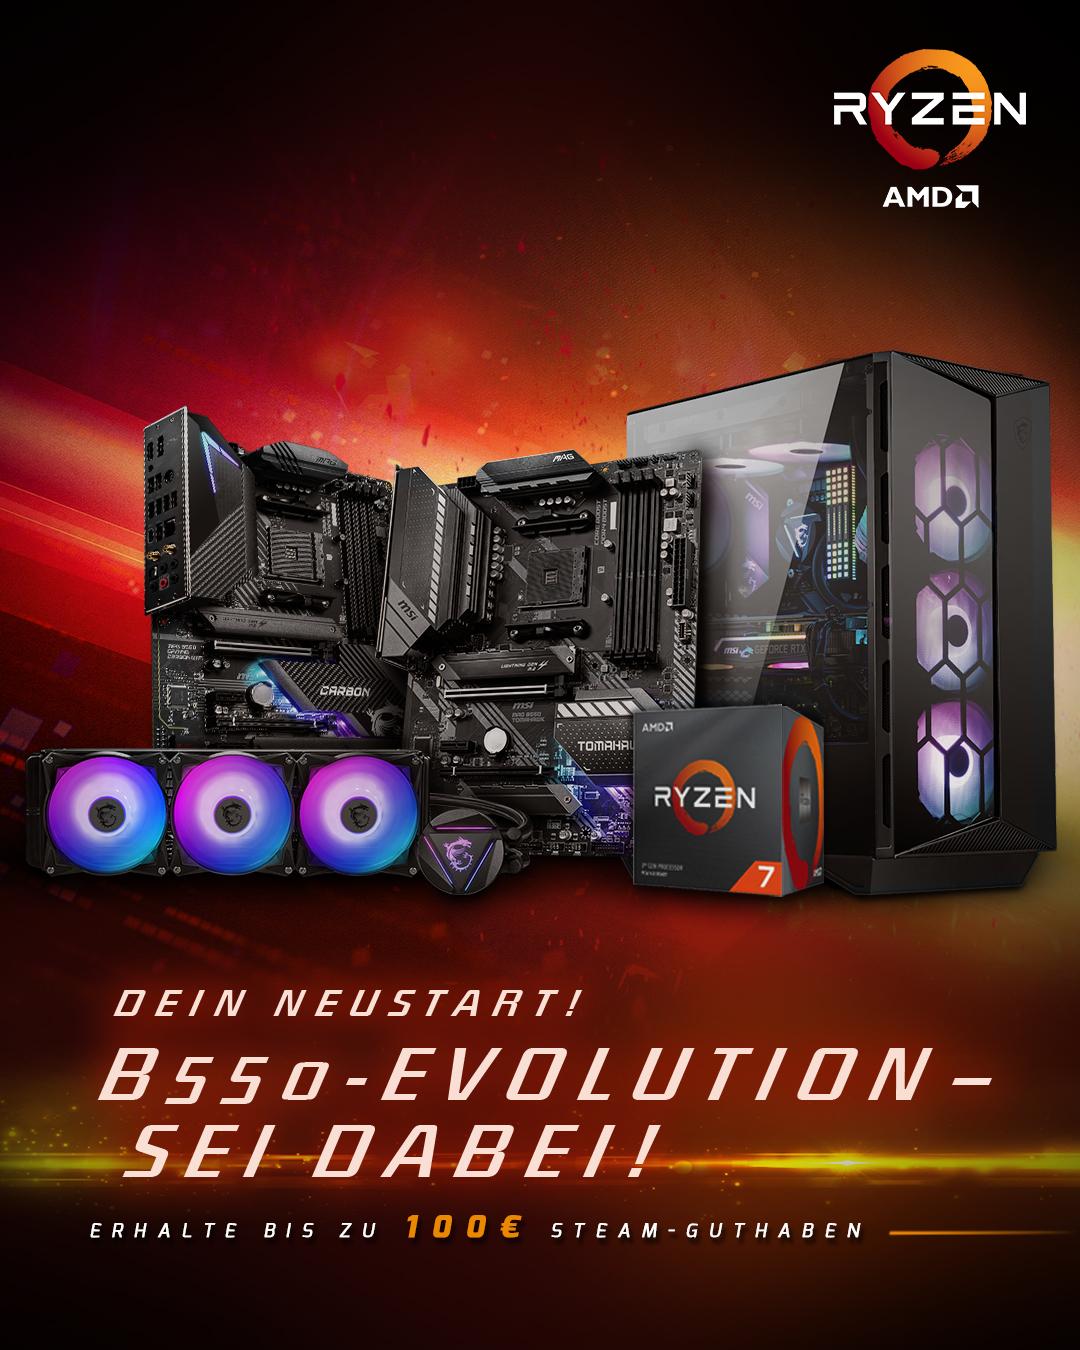 B550 + AMD CPU promotion